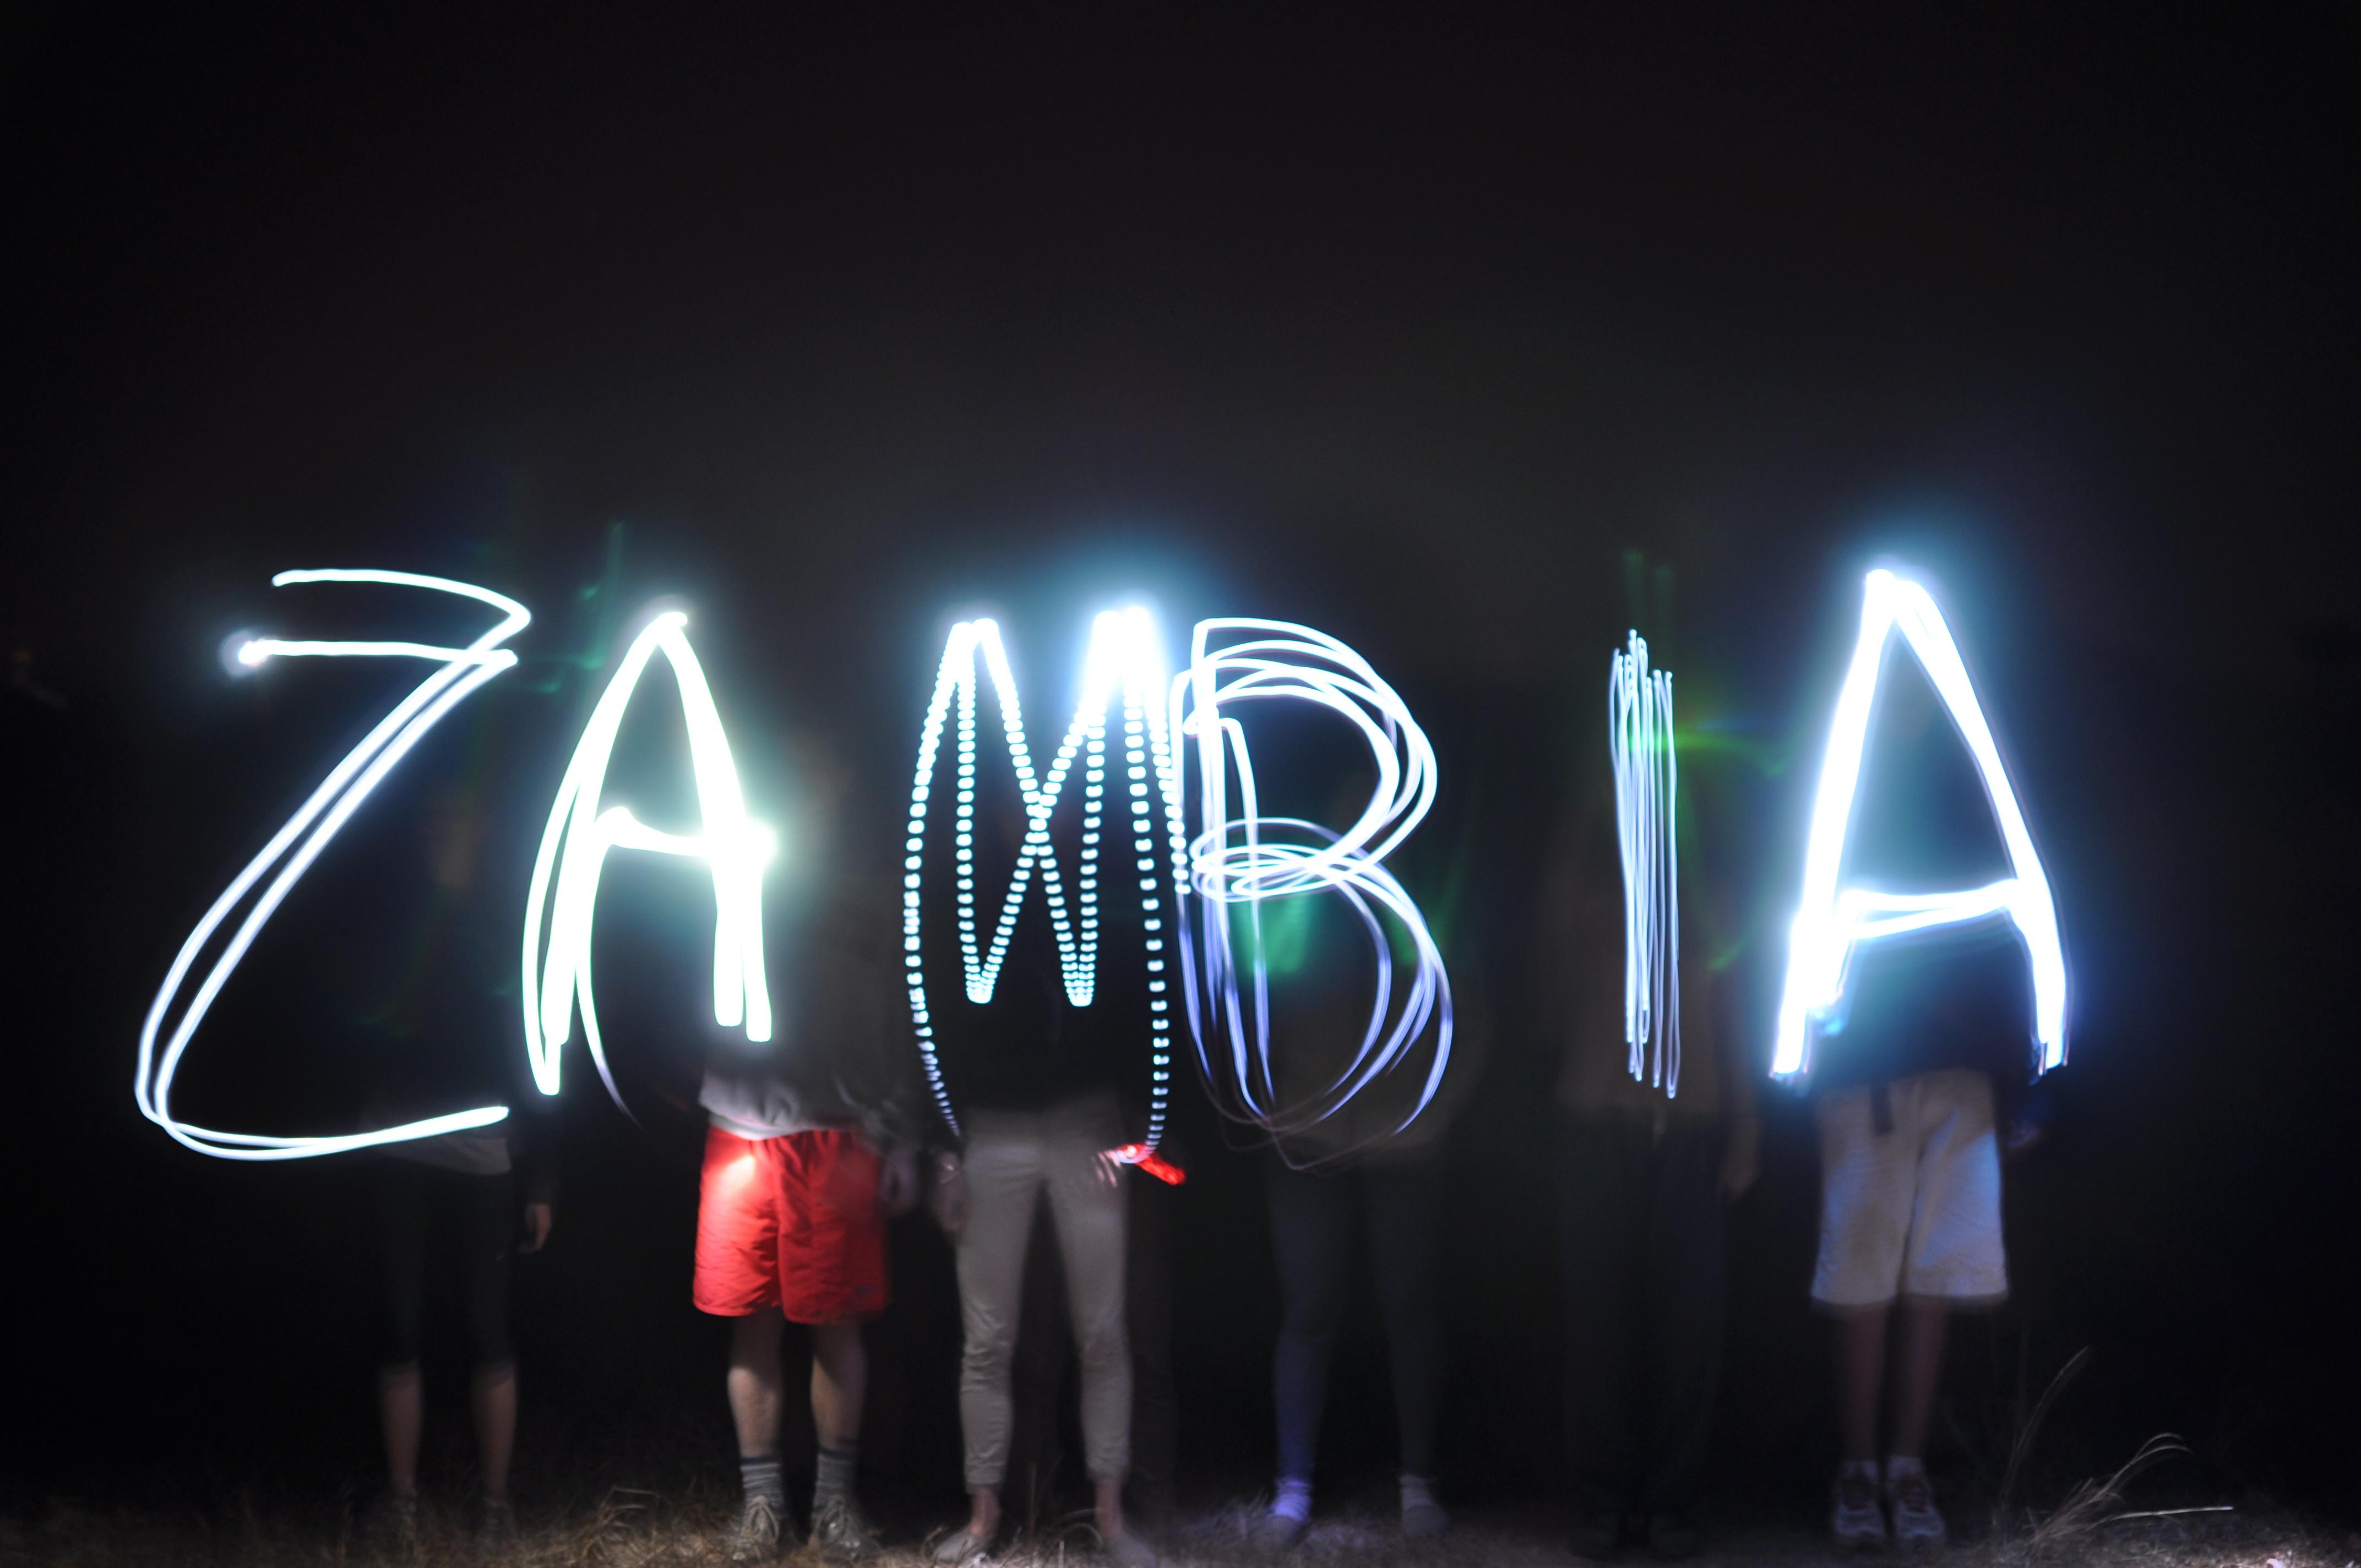 Zambia! (Photo courtesy Tommy Adams and SAAS-ZC.)